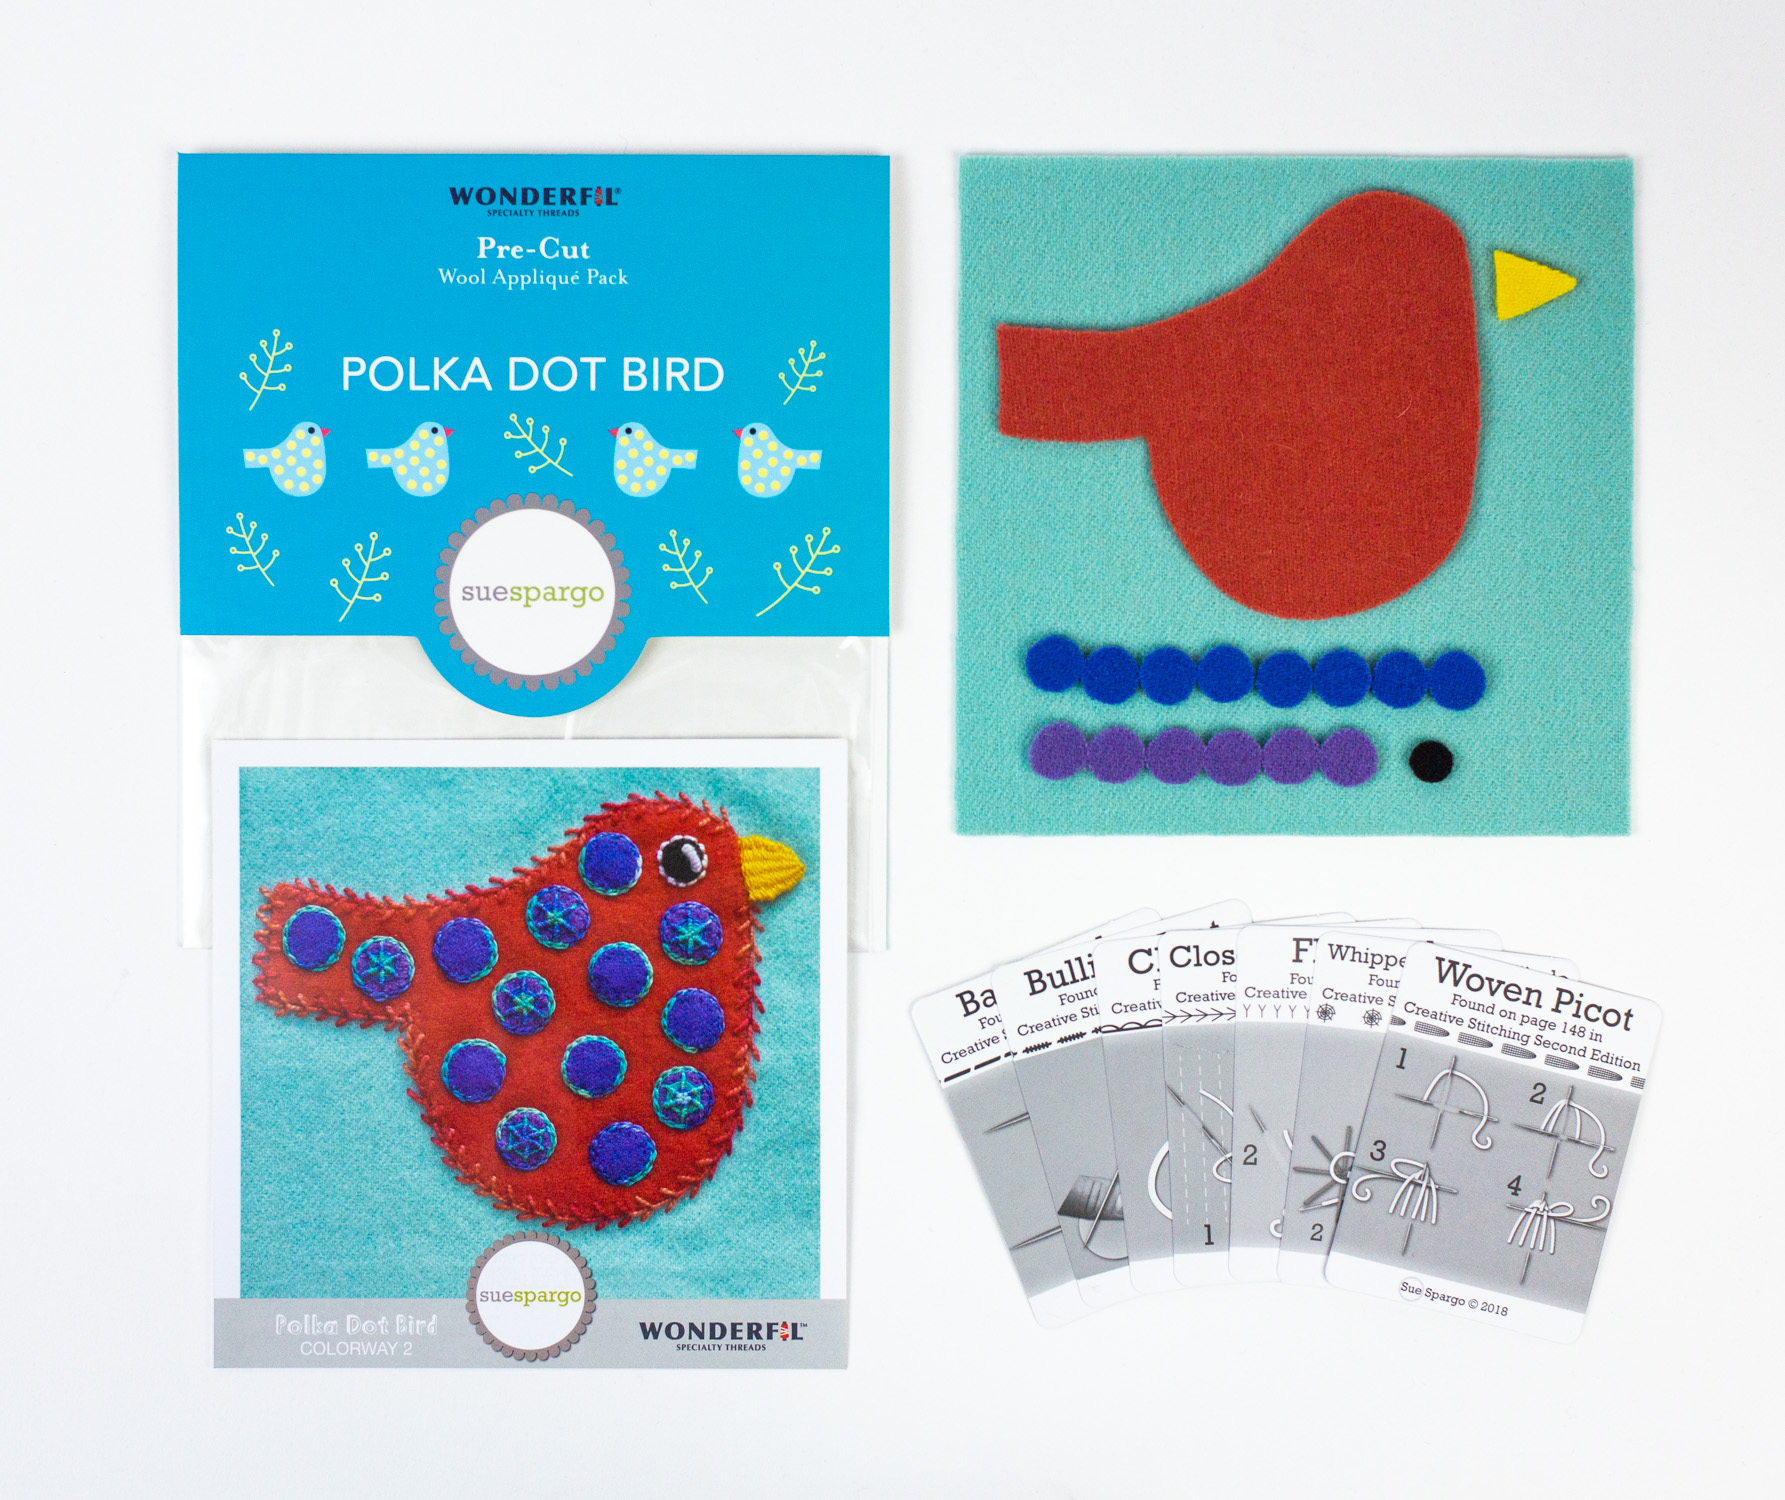 Polka Dot Bird2-inside.jpg